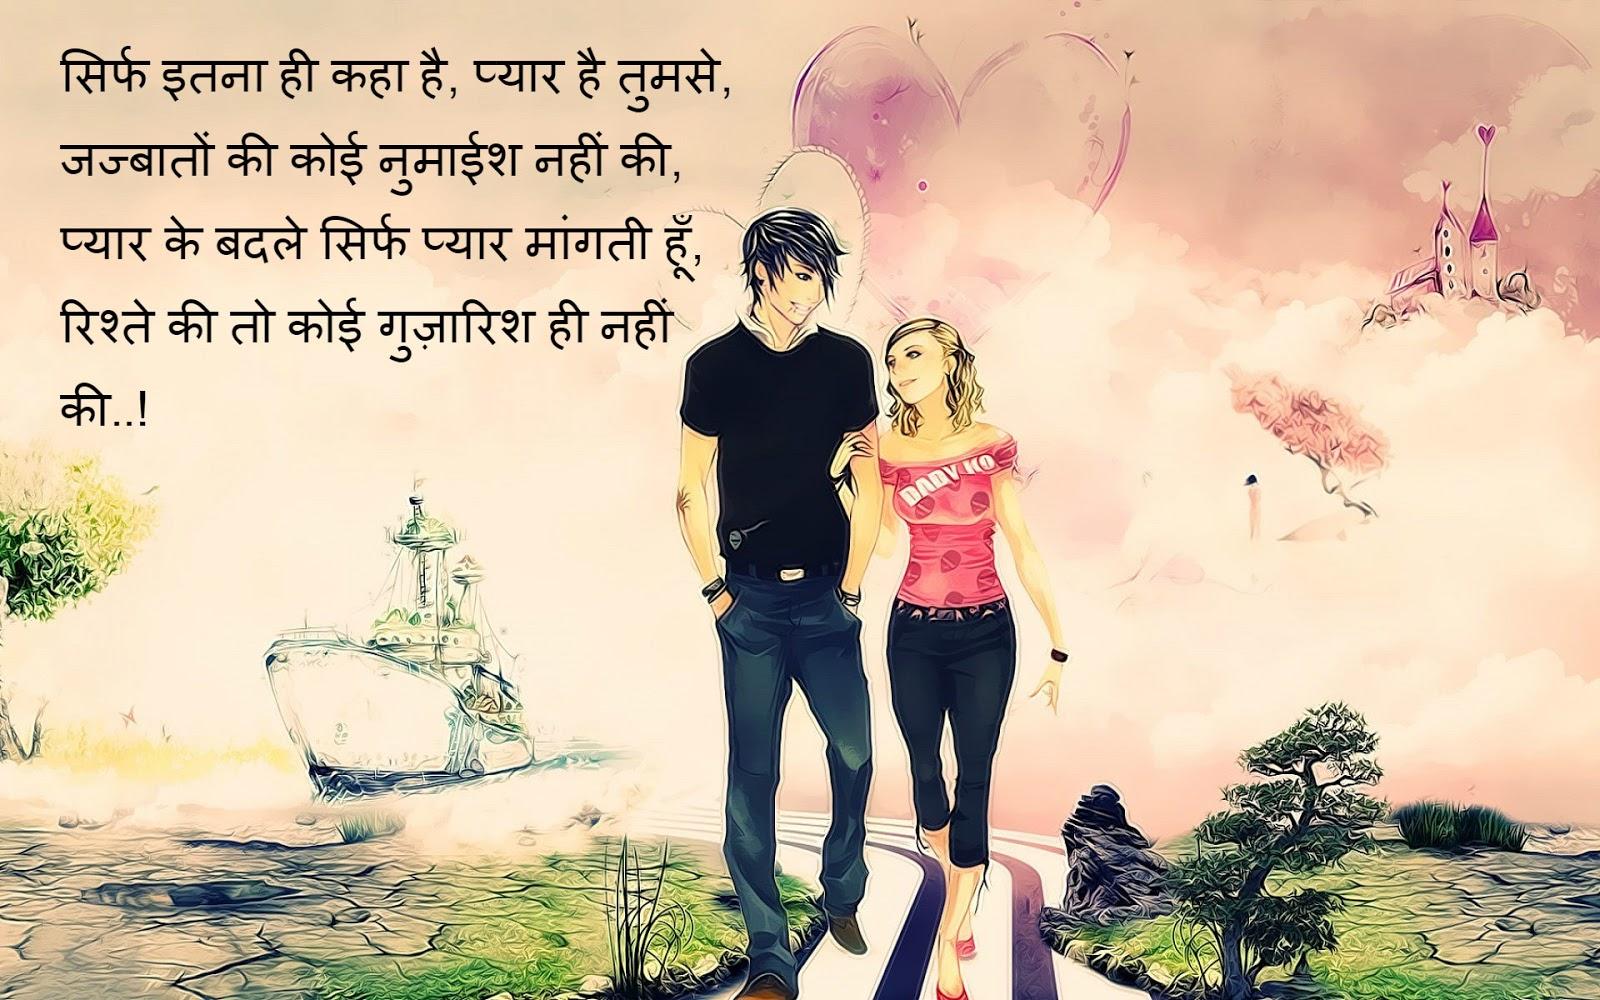 whatsapp shayari hd wallpapers all letest love shayri hd